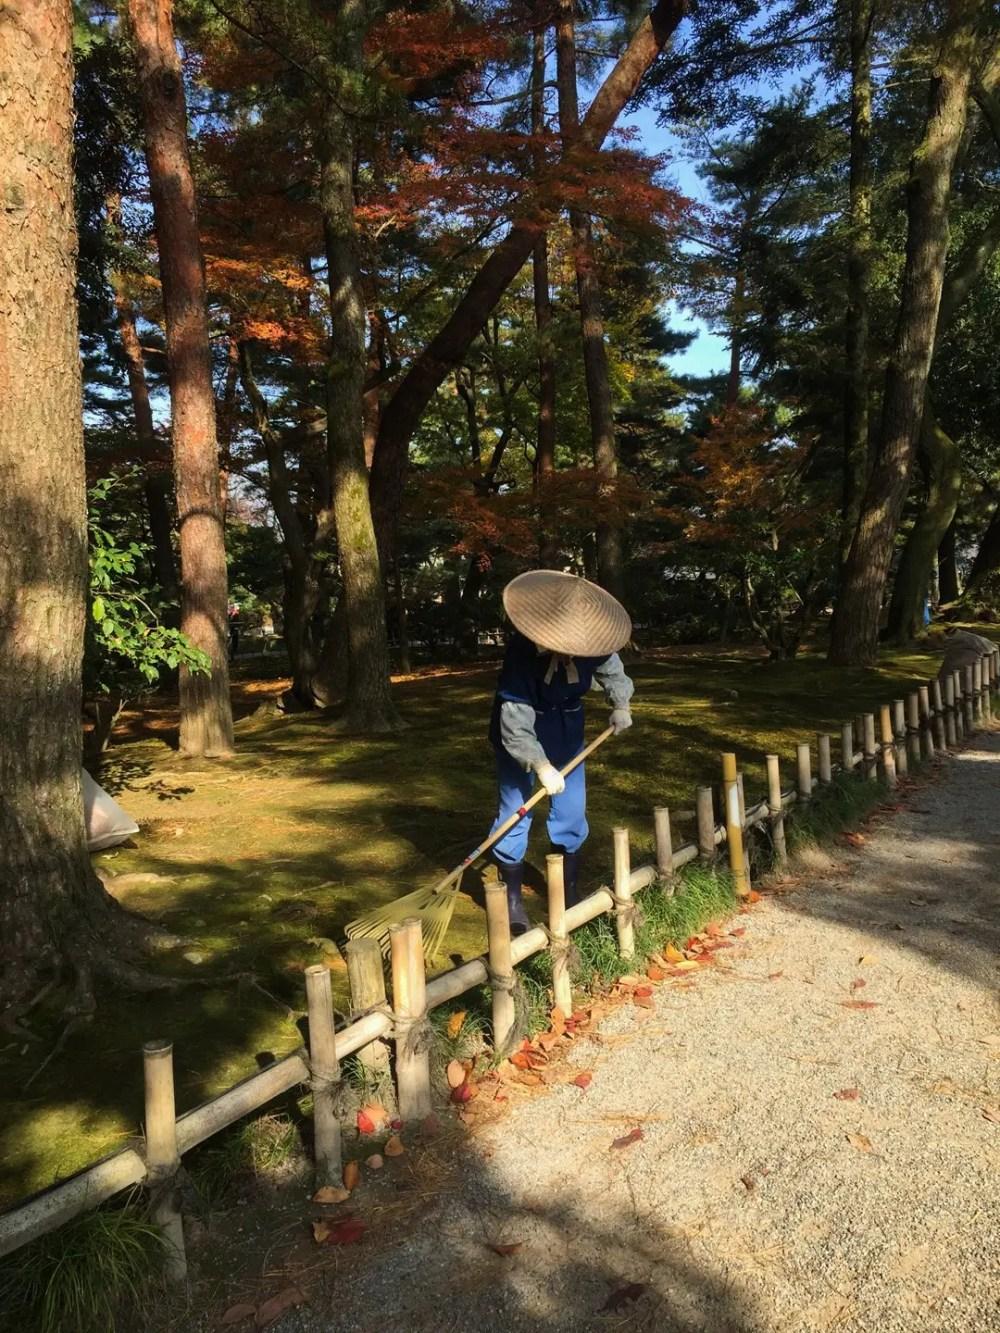 Kenrokuen-008 Kenroku-en  -  Kanazawa, Japan Japan Kanazawa  Kanazawa Japan Garden featured